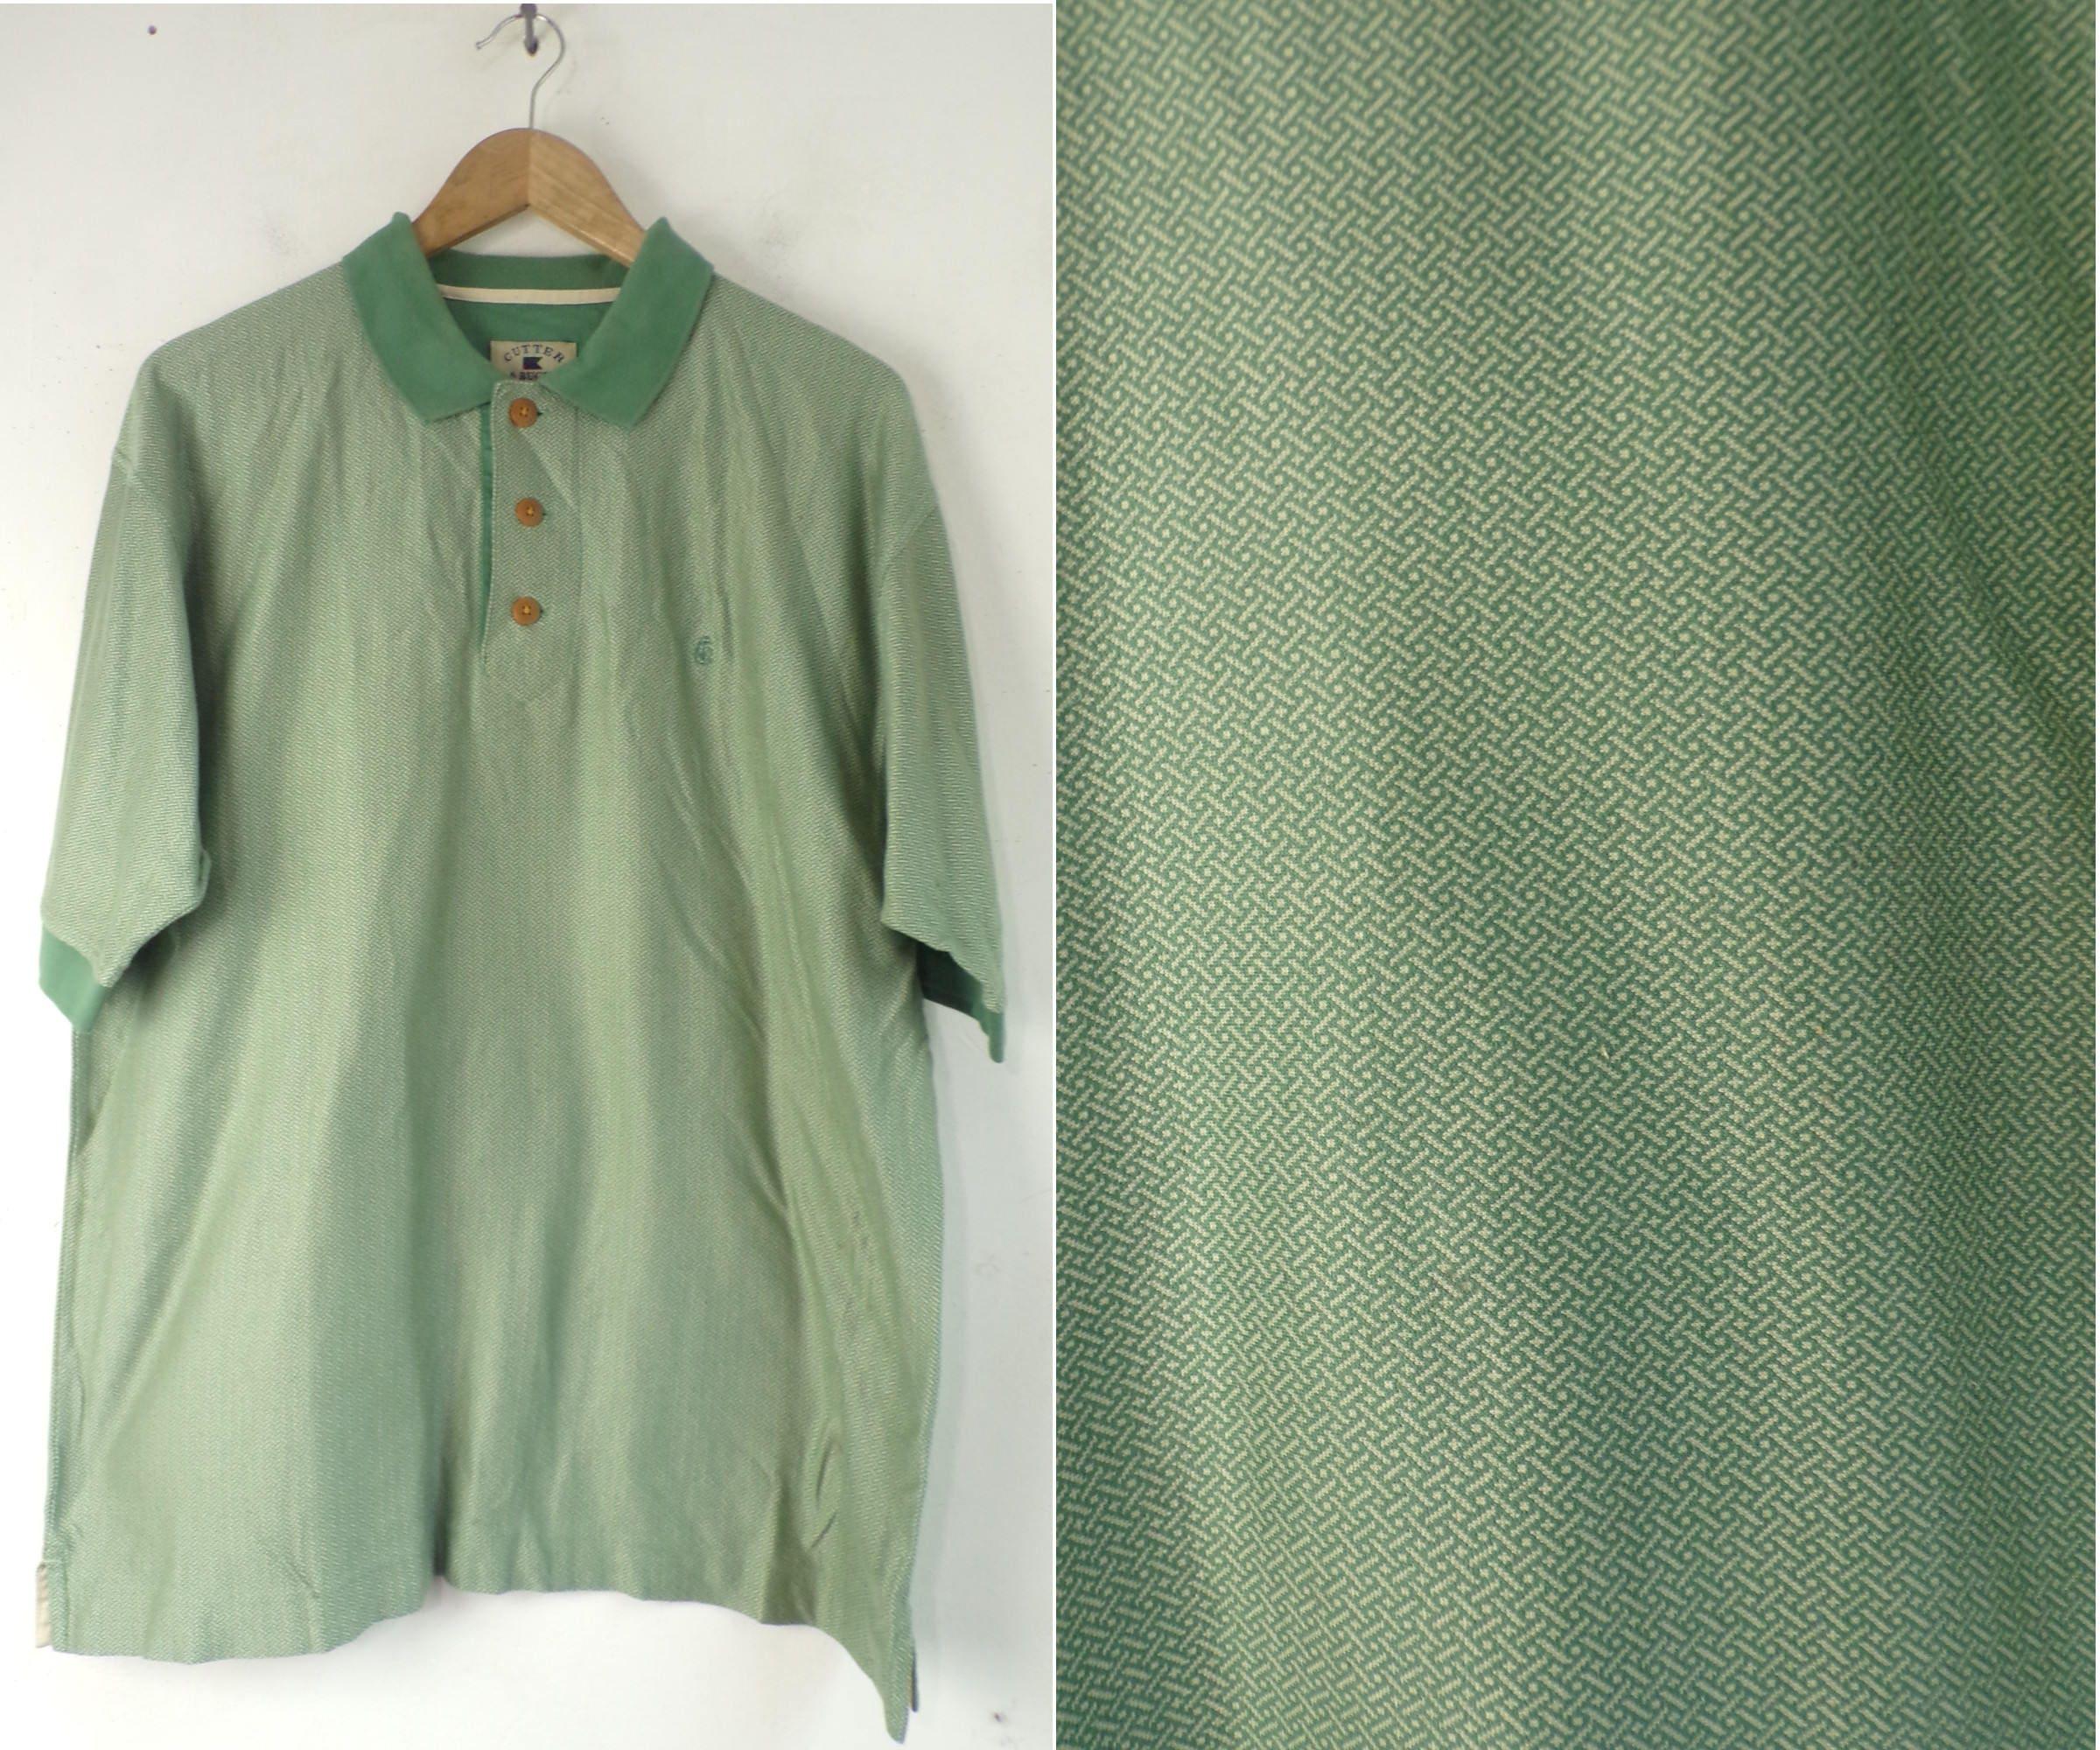 90s Green Printed Polo Shirt Mens Medium Cutter Buck Mens Etsy